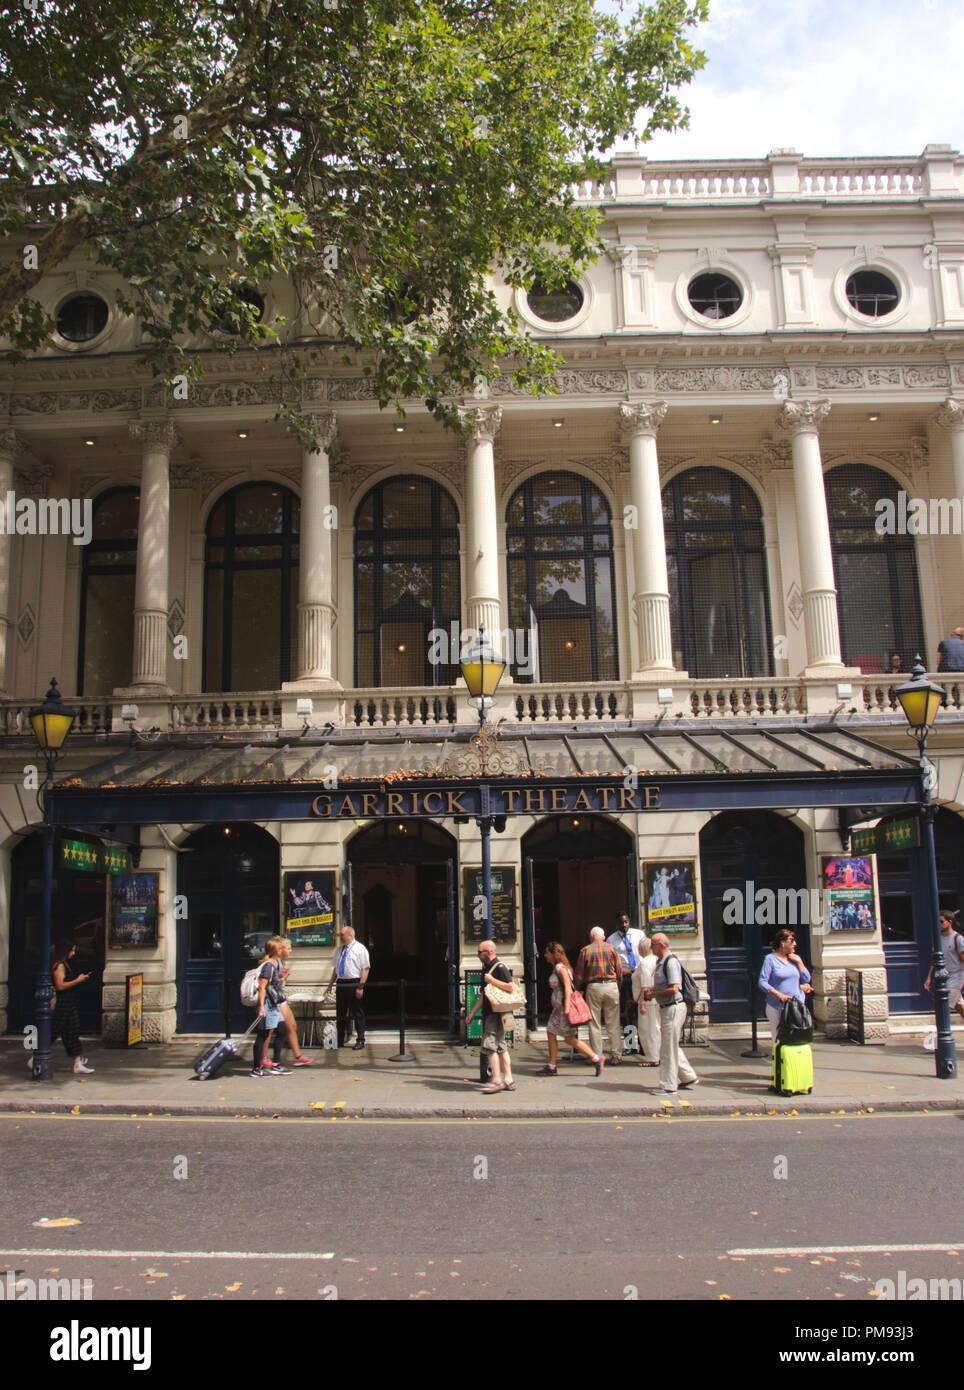 Garrick Theatre Charing Cross Road London Stock Photo